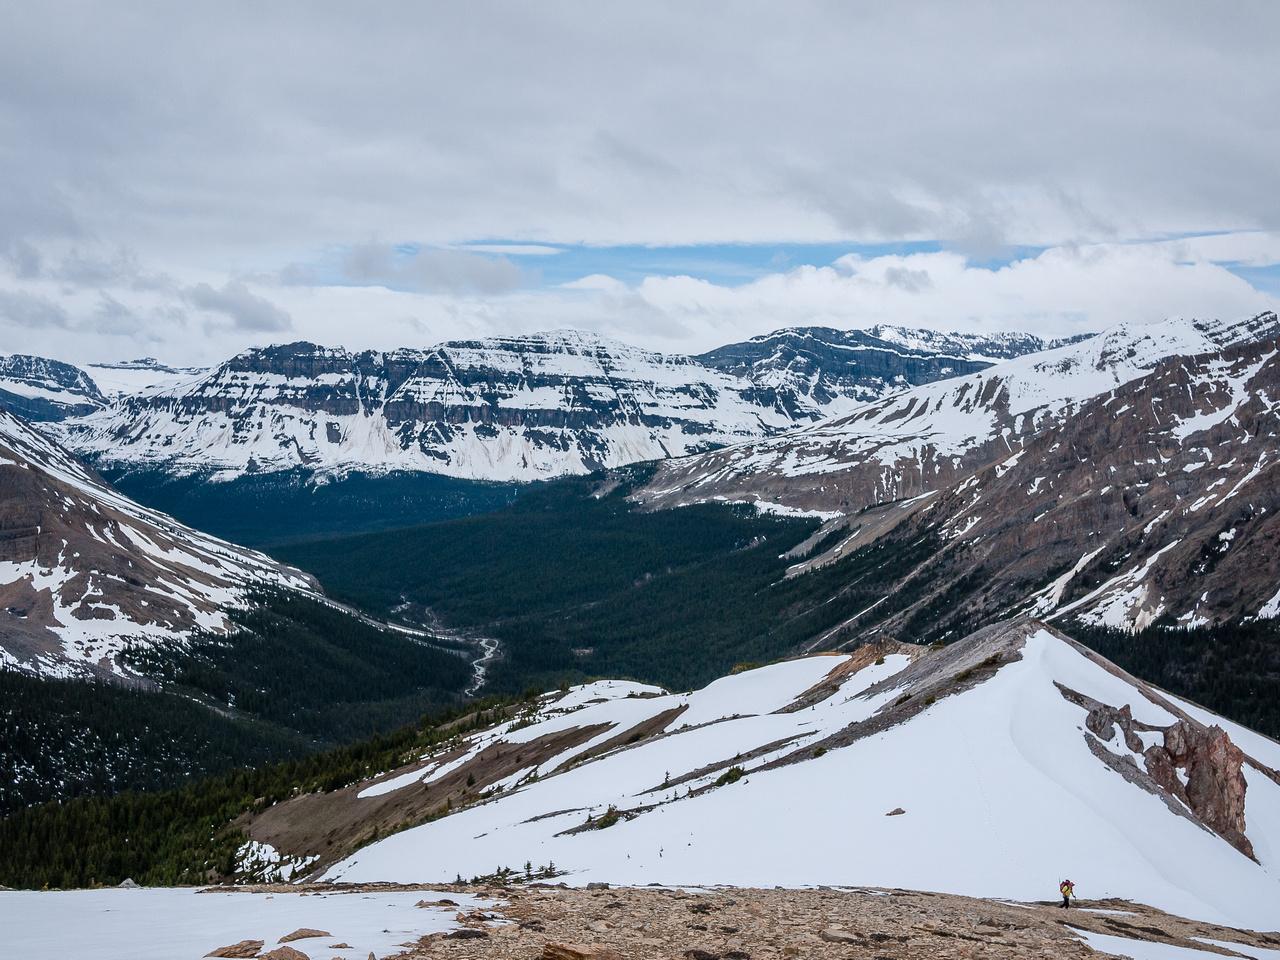 Looking back at Kev coming up the ridge.